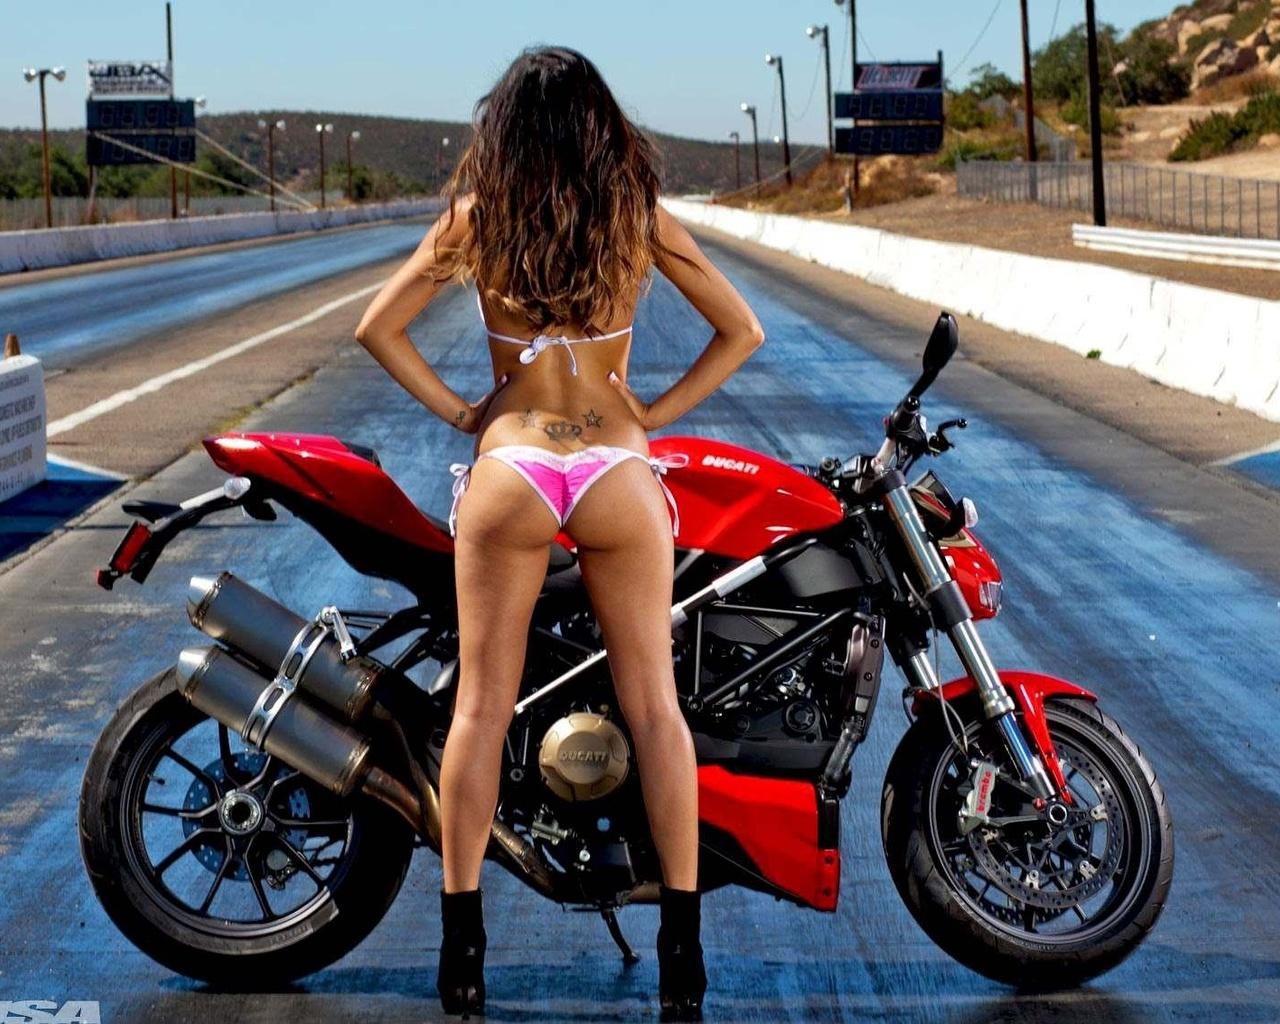 video-devka-baldeet-ot-sportivnogo-mototsikla